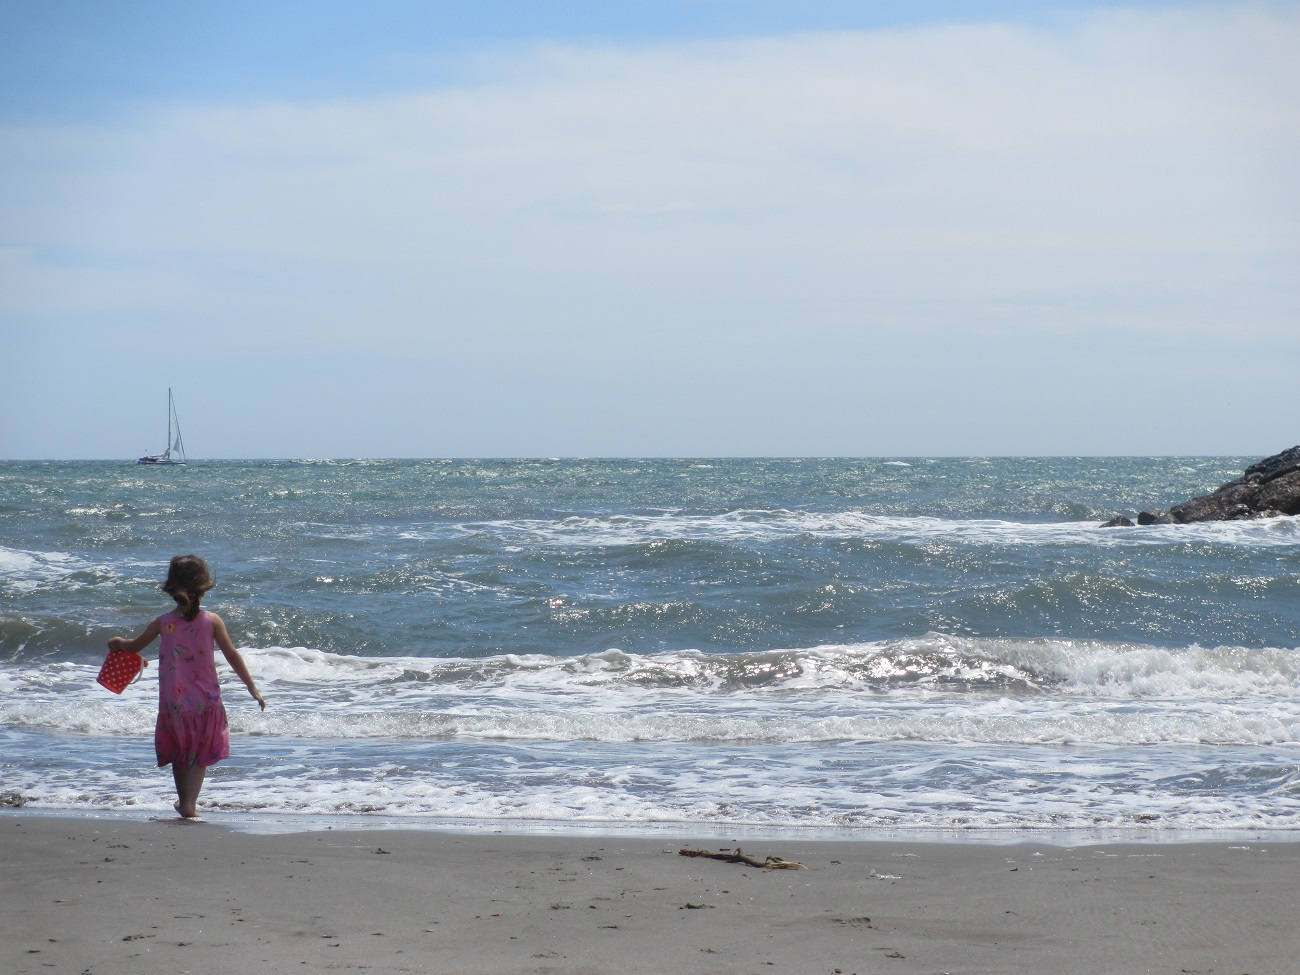 Hieman erilaista Välimerta, Saintes-Maries-de-la-Mer